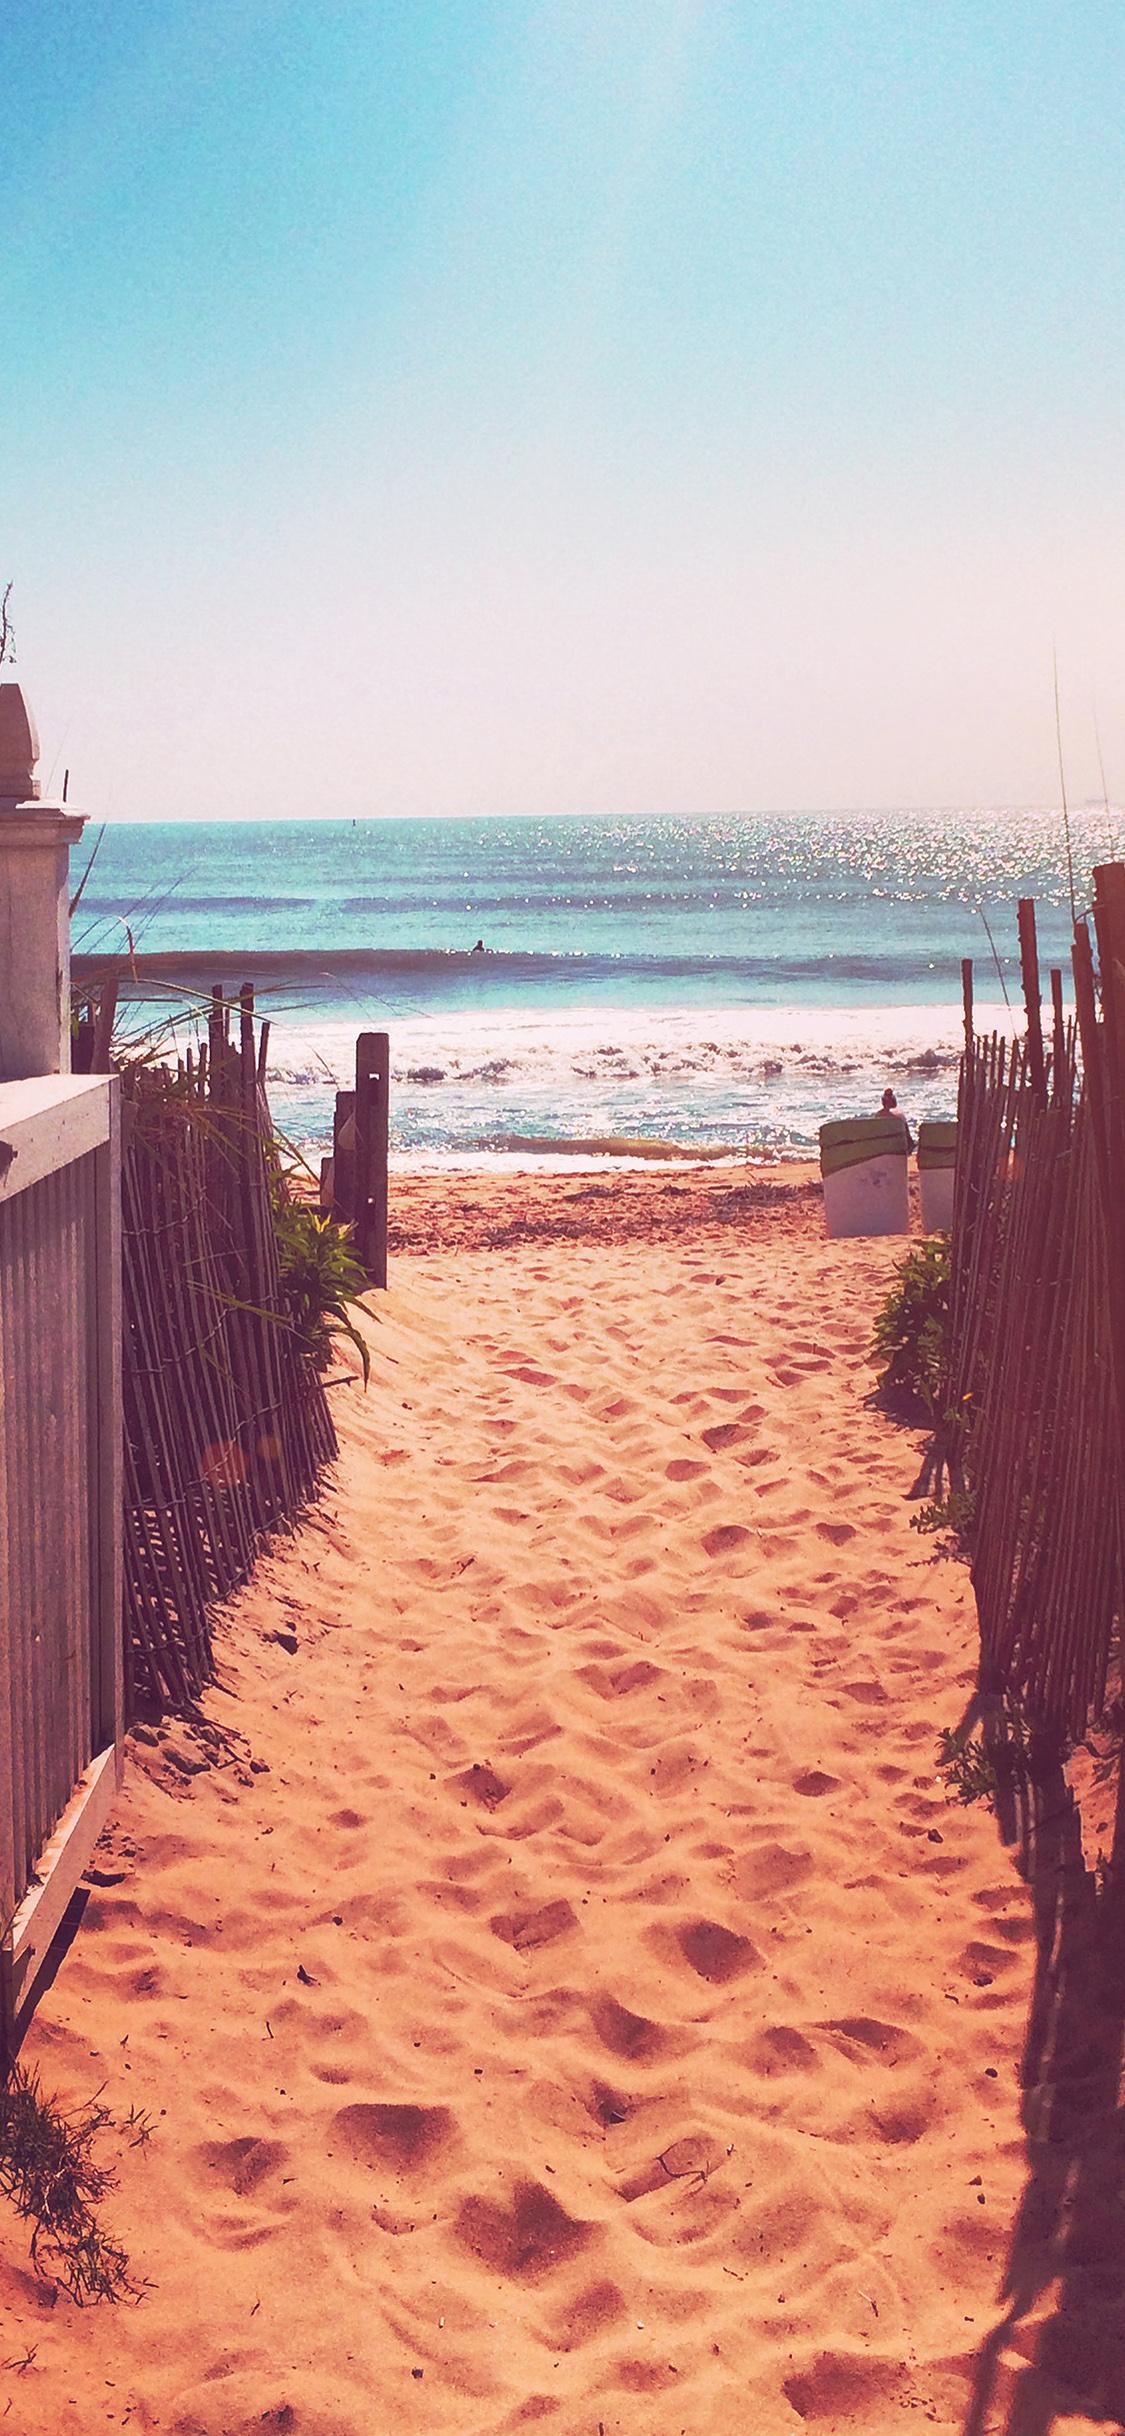 Iphonexpapers Com Iphone X Wallpaper Mq83 Way To Sea Sand Ocean